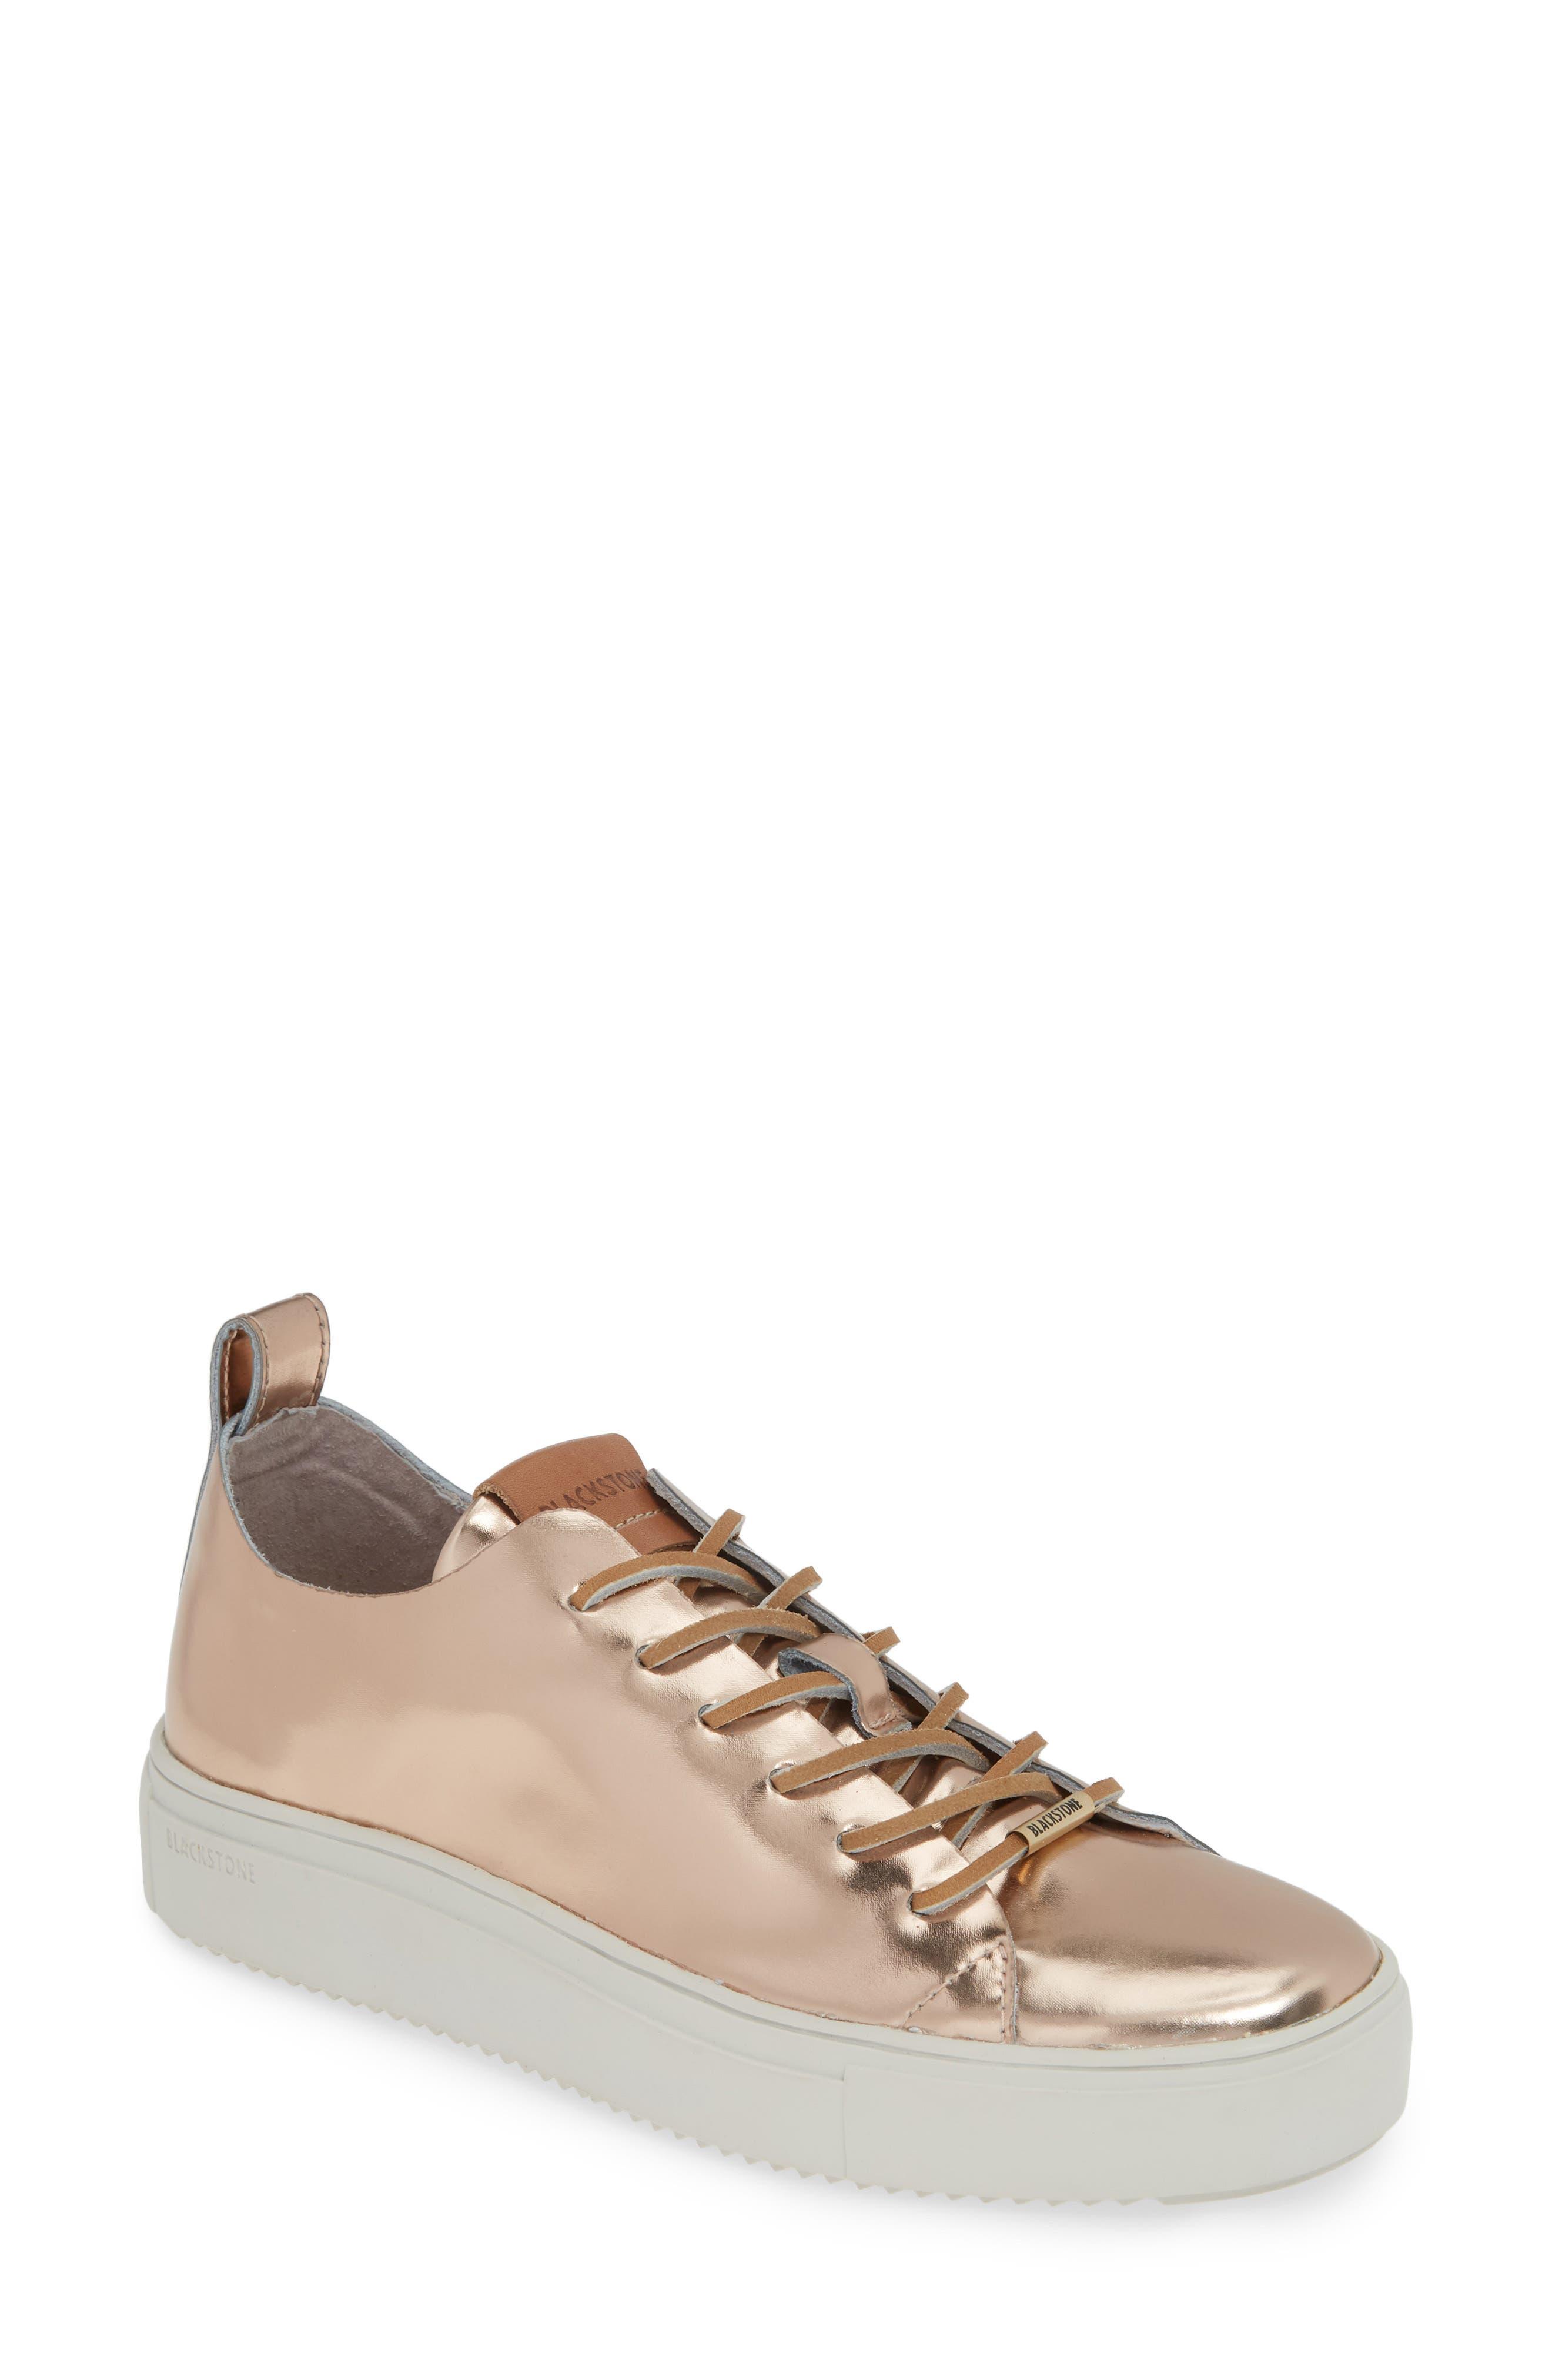 Blackstone Rl69 Metallic Mid Top Sneaker, Pink